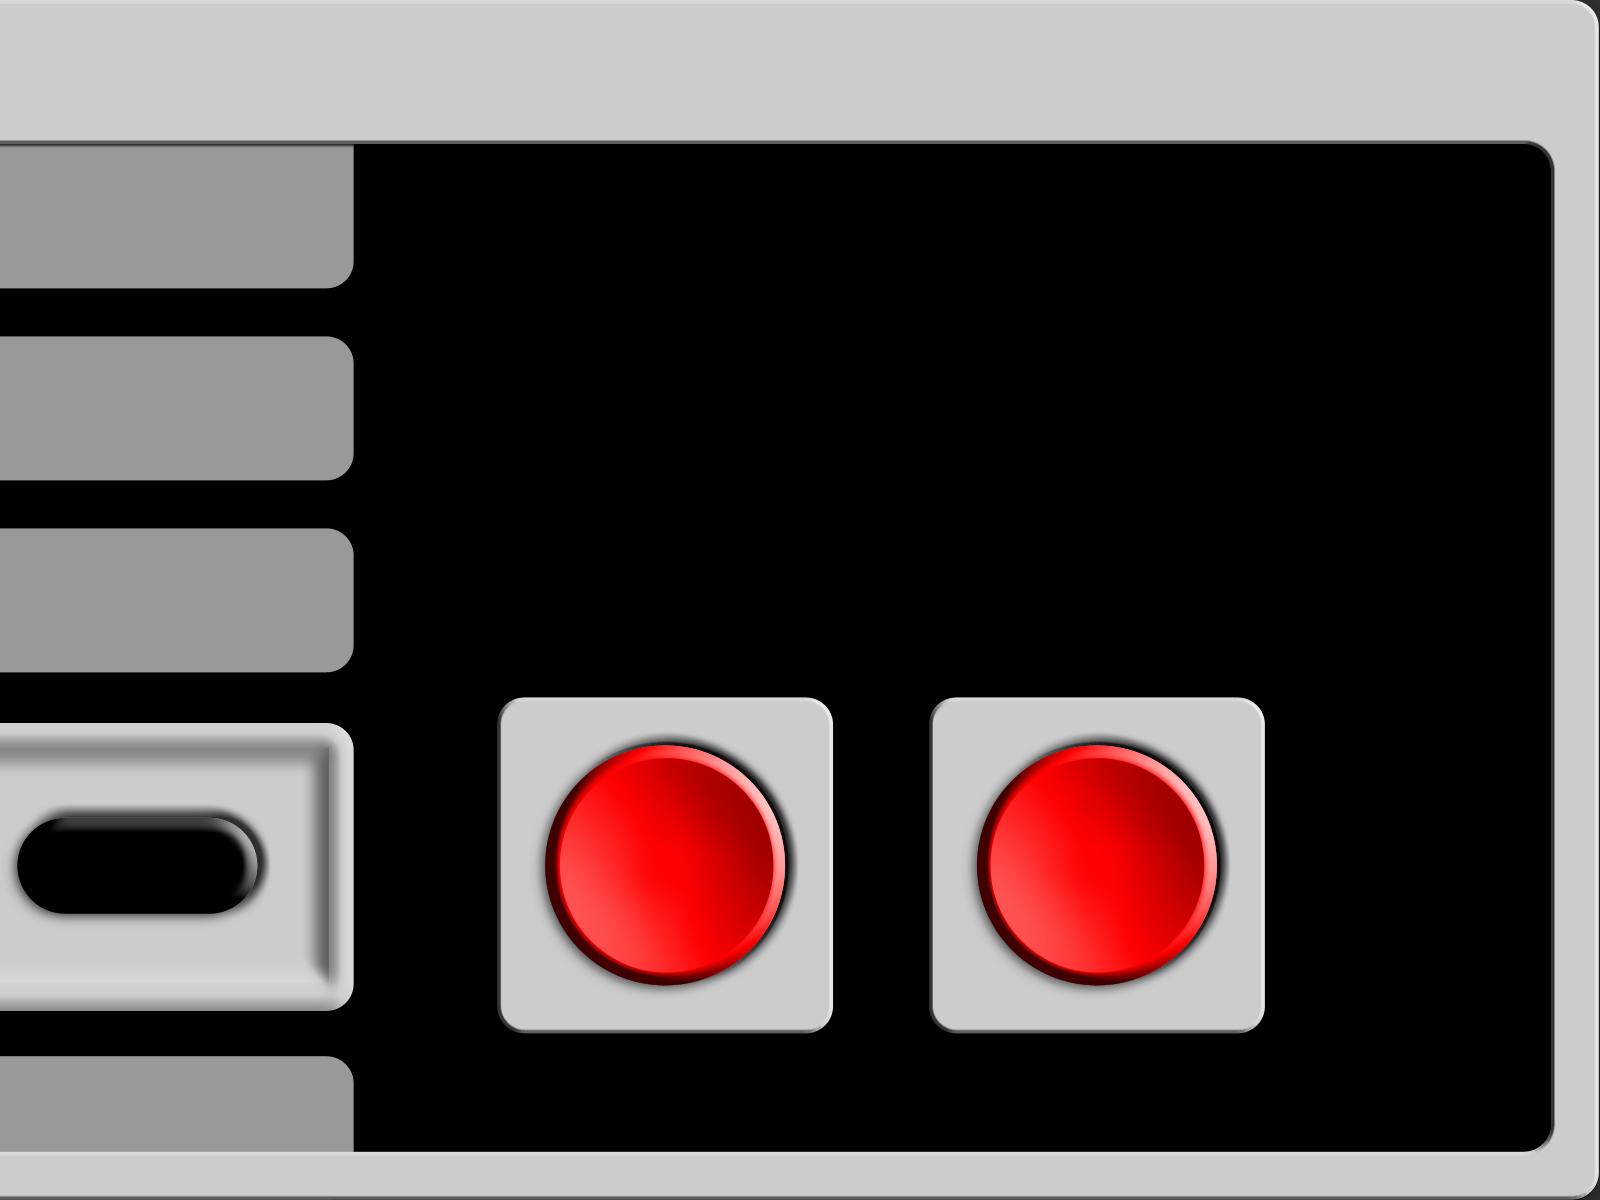 De 20 bästa NES-spelen: Plats 3